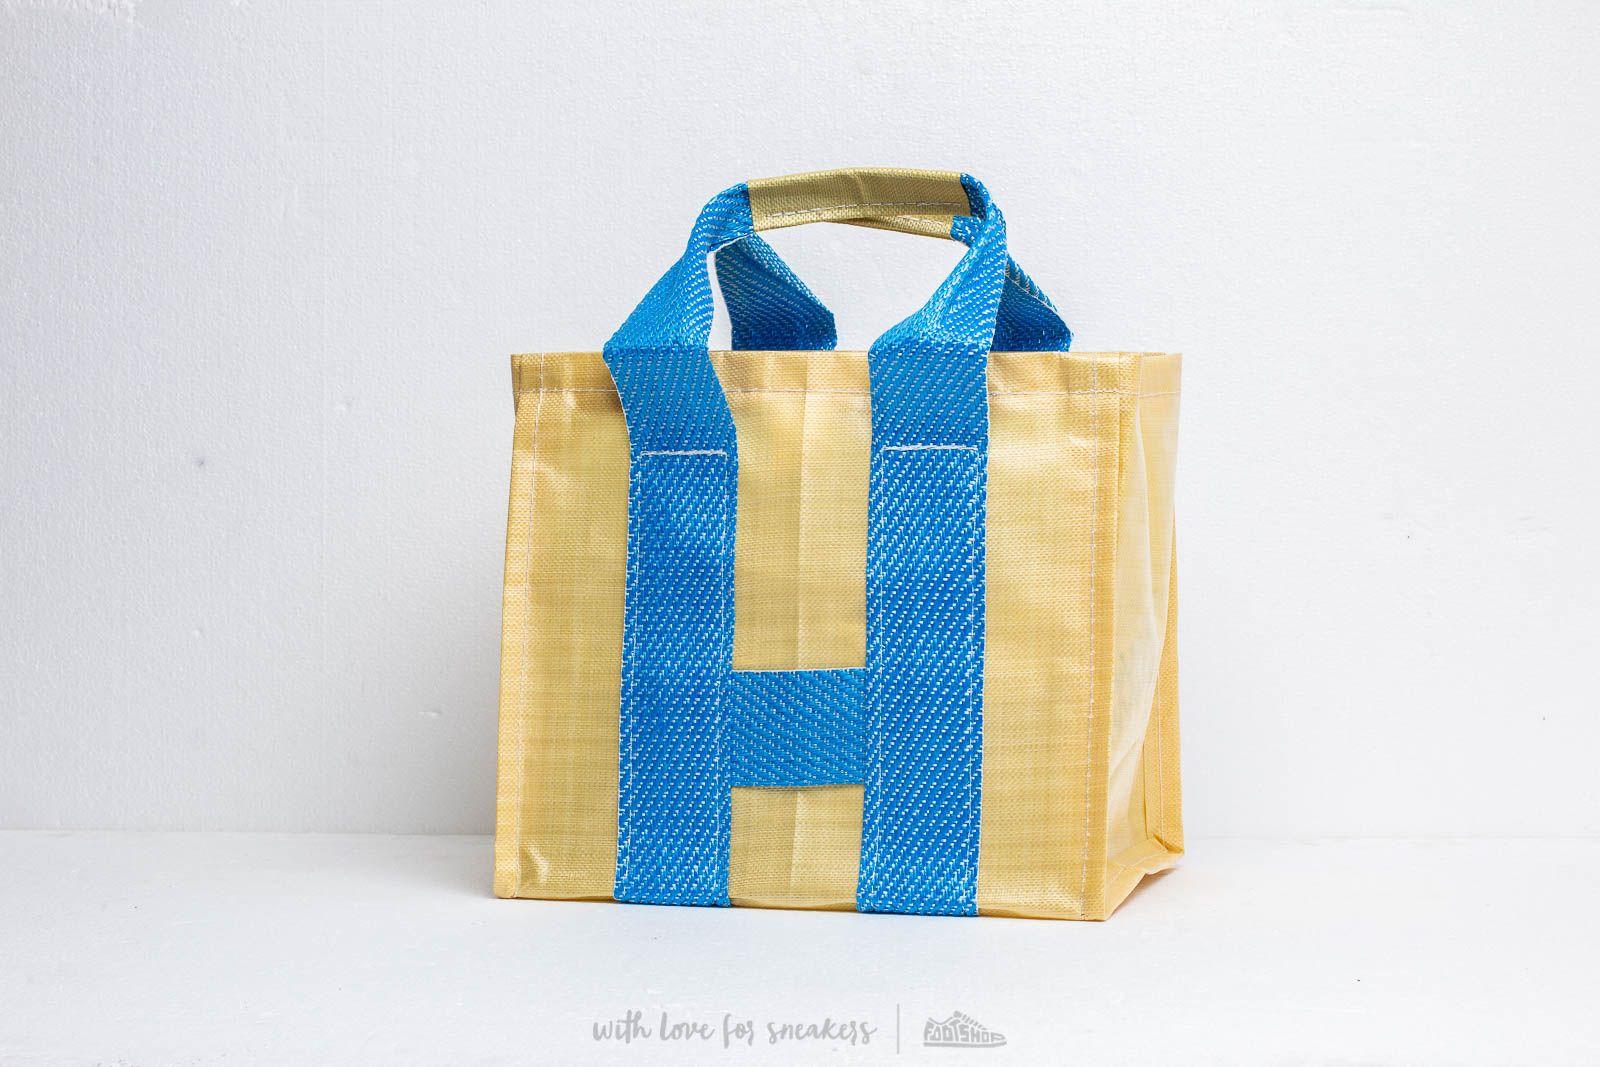 Comme des Garçons Shirt S27612 Bag